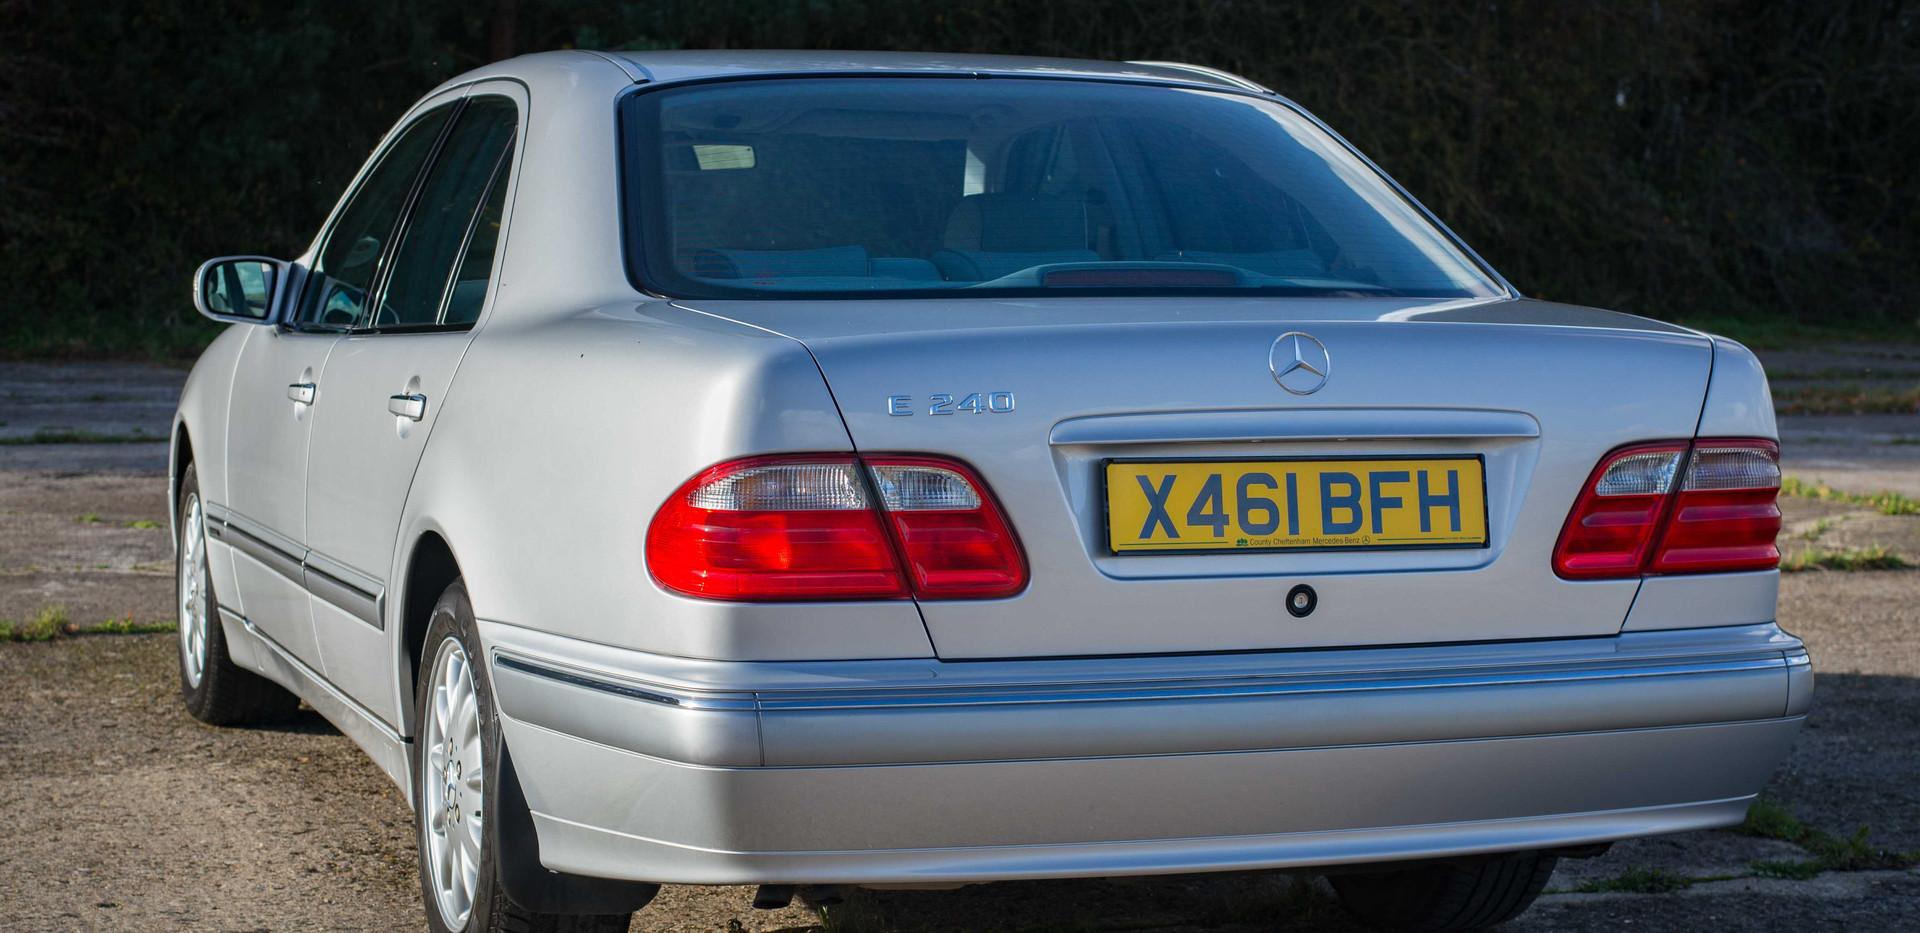 Mercedes E240 For Sale UK London  (34 of